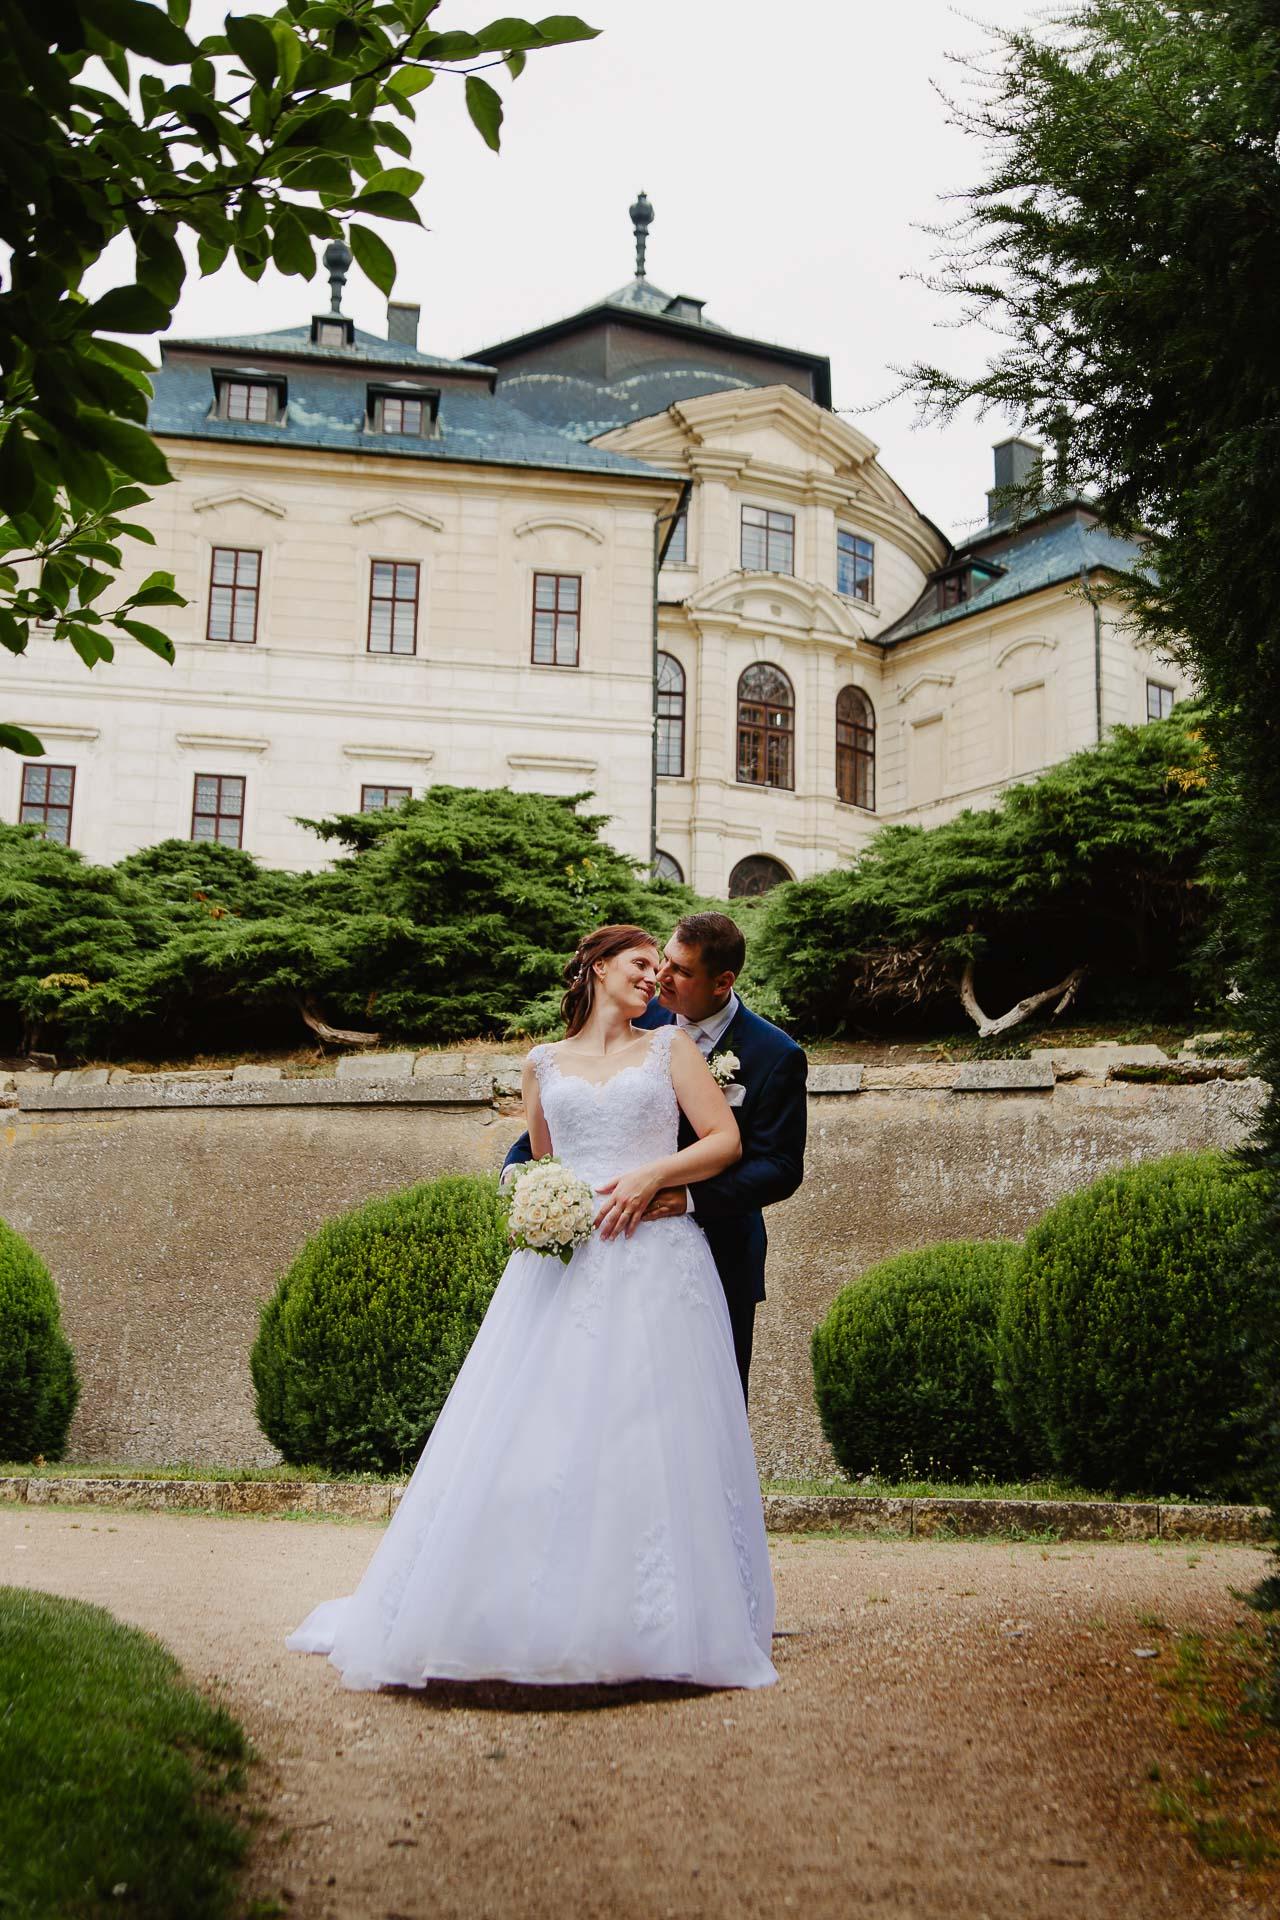 Svatební-fotograf-zámek-Karlova-Koruna-Chlumec-nad-Cidlinou-152